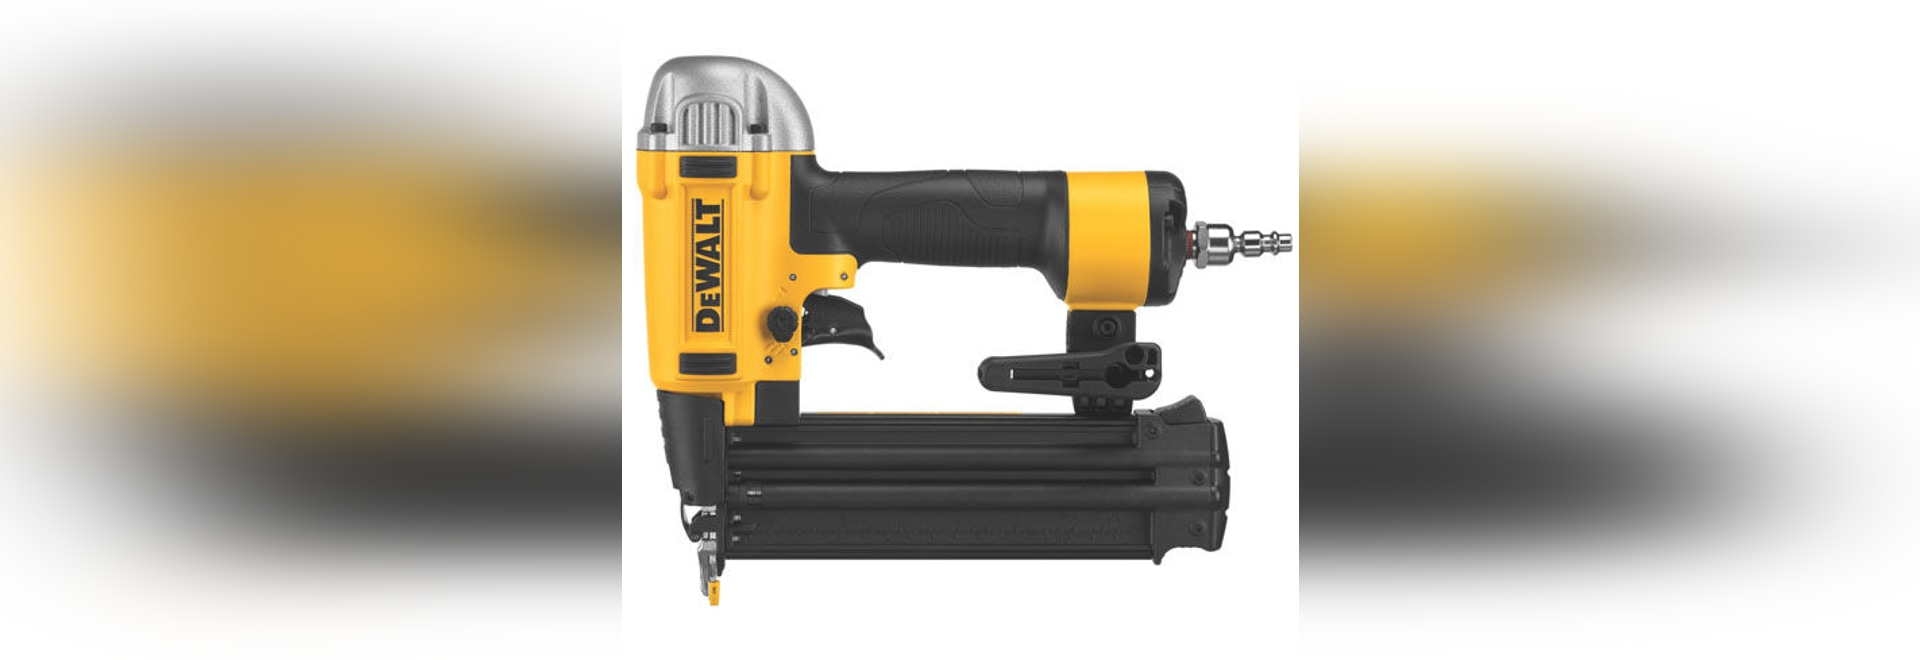 NEW: pneumatic nail gun by DEWALT Industrial Tool